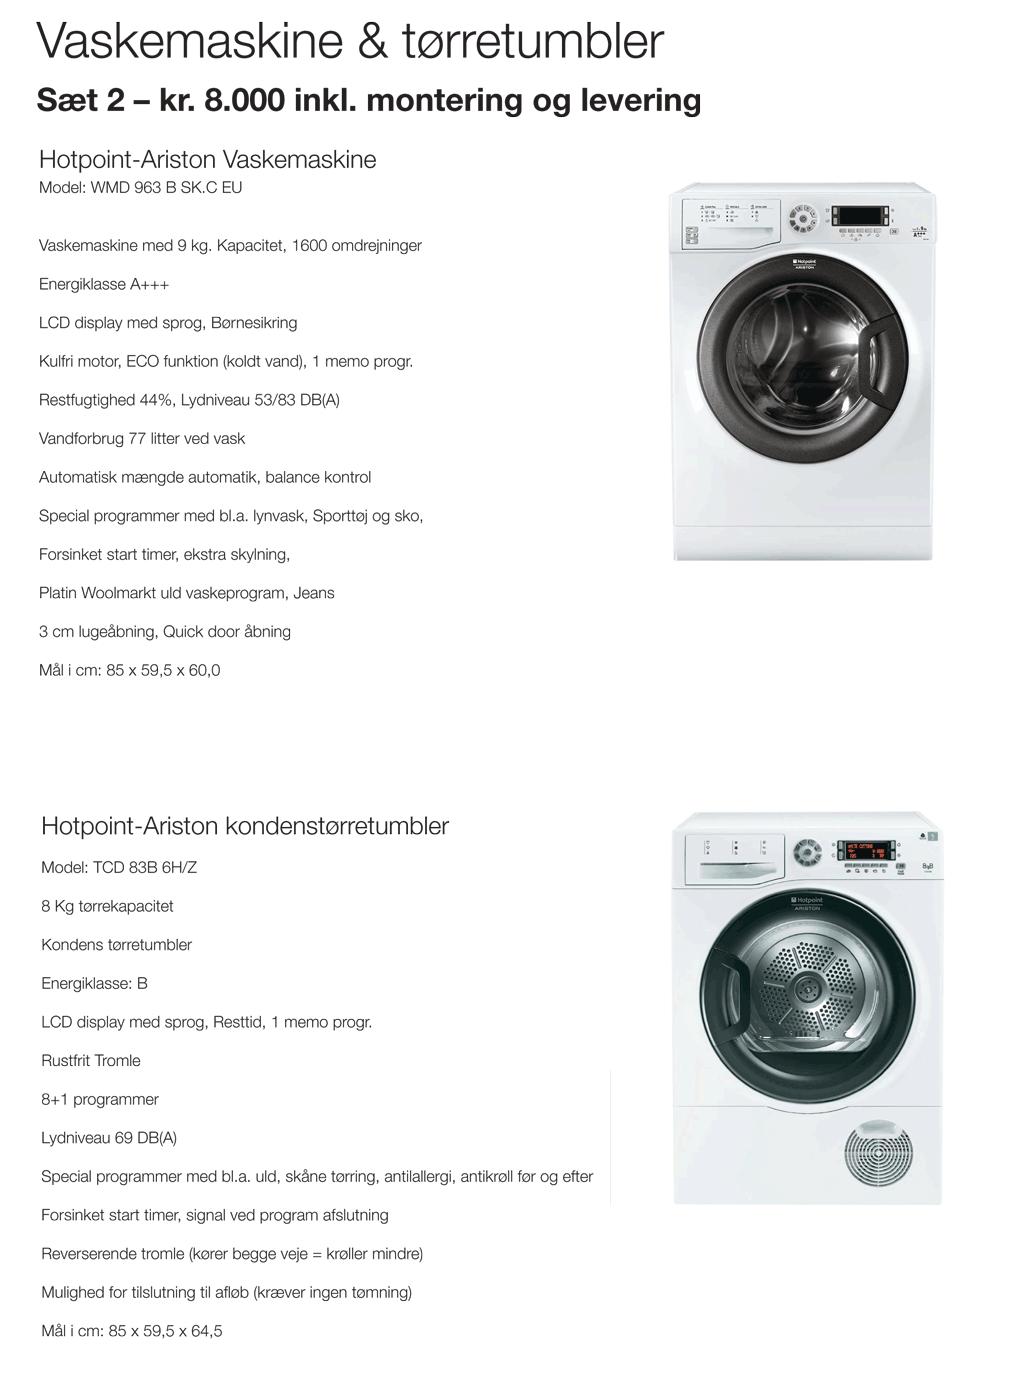 Vaskemaskine med tørretumbler tilbud